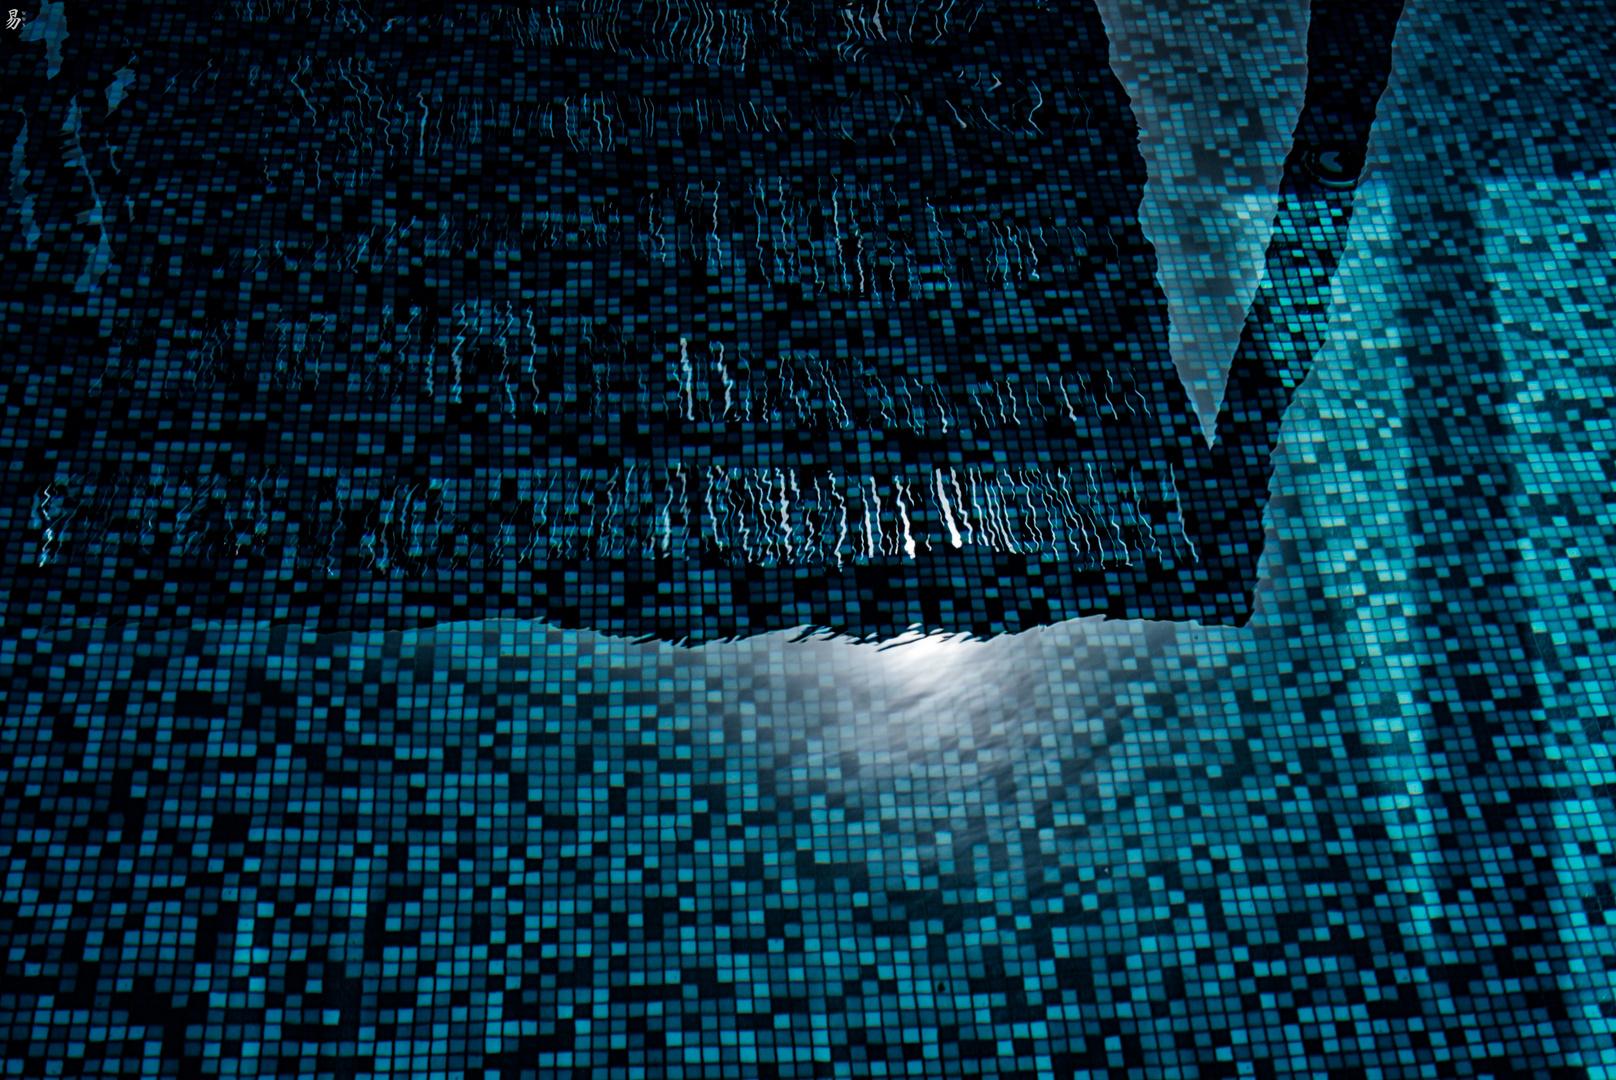 pool flares